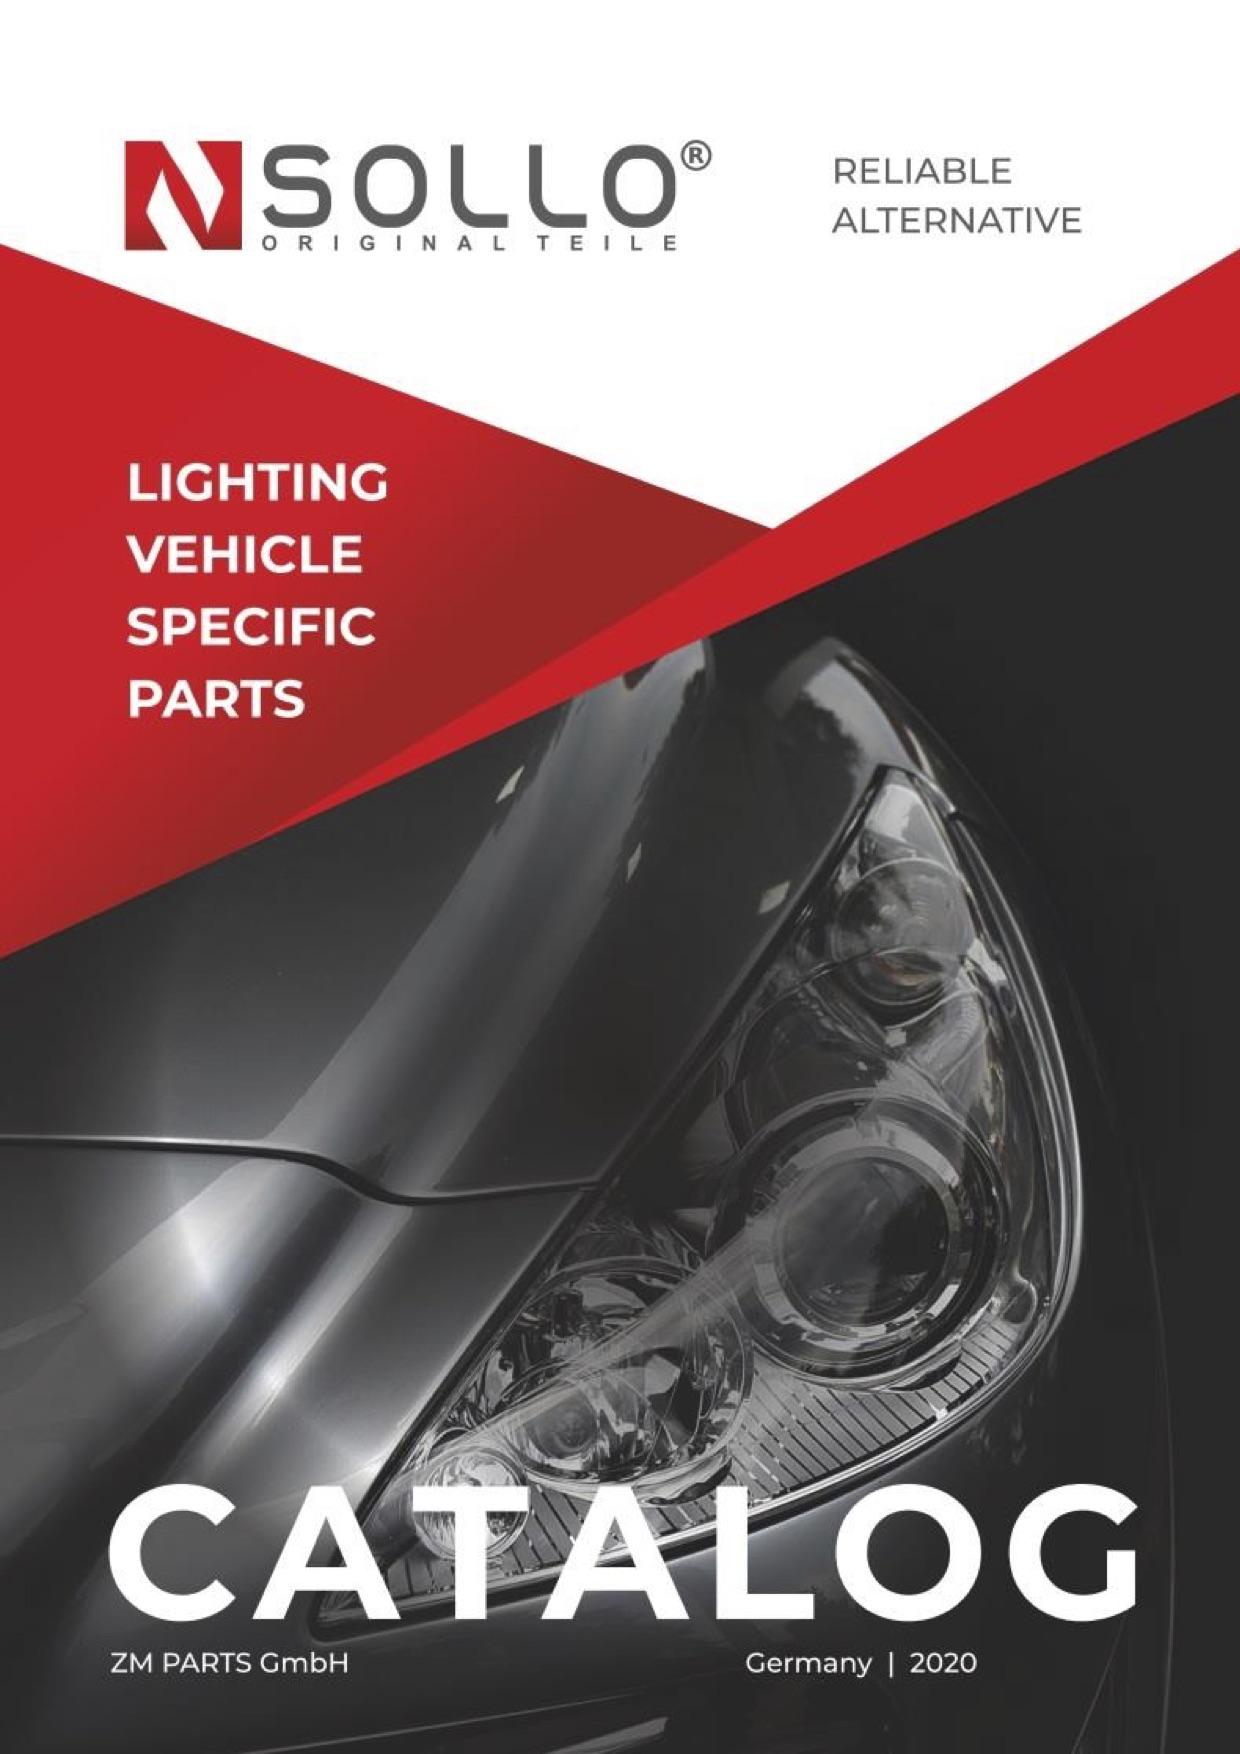 SOLLO_CATALOG_2020_Lighting_Vehicle_Specific_Parts